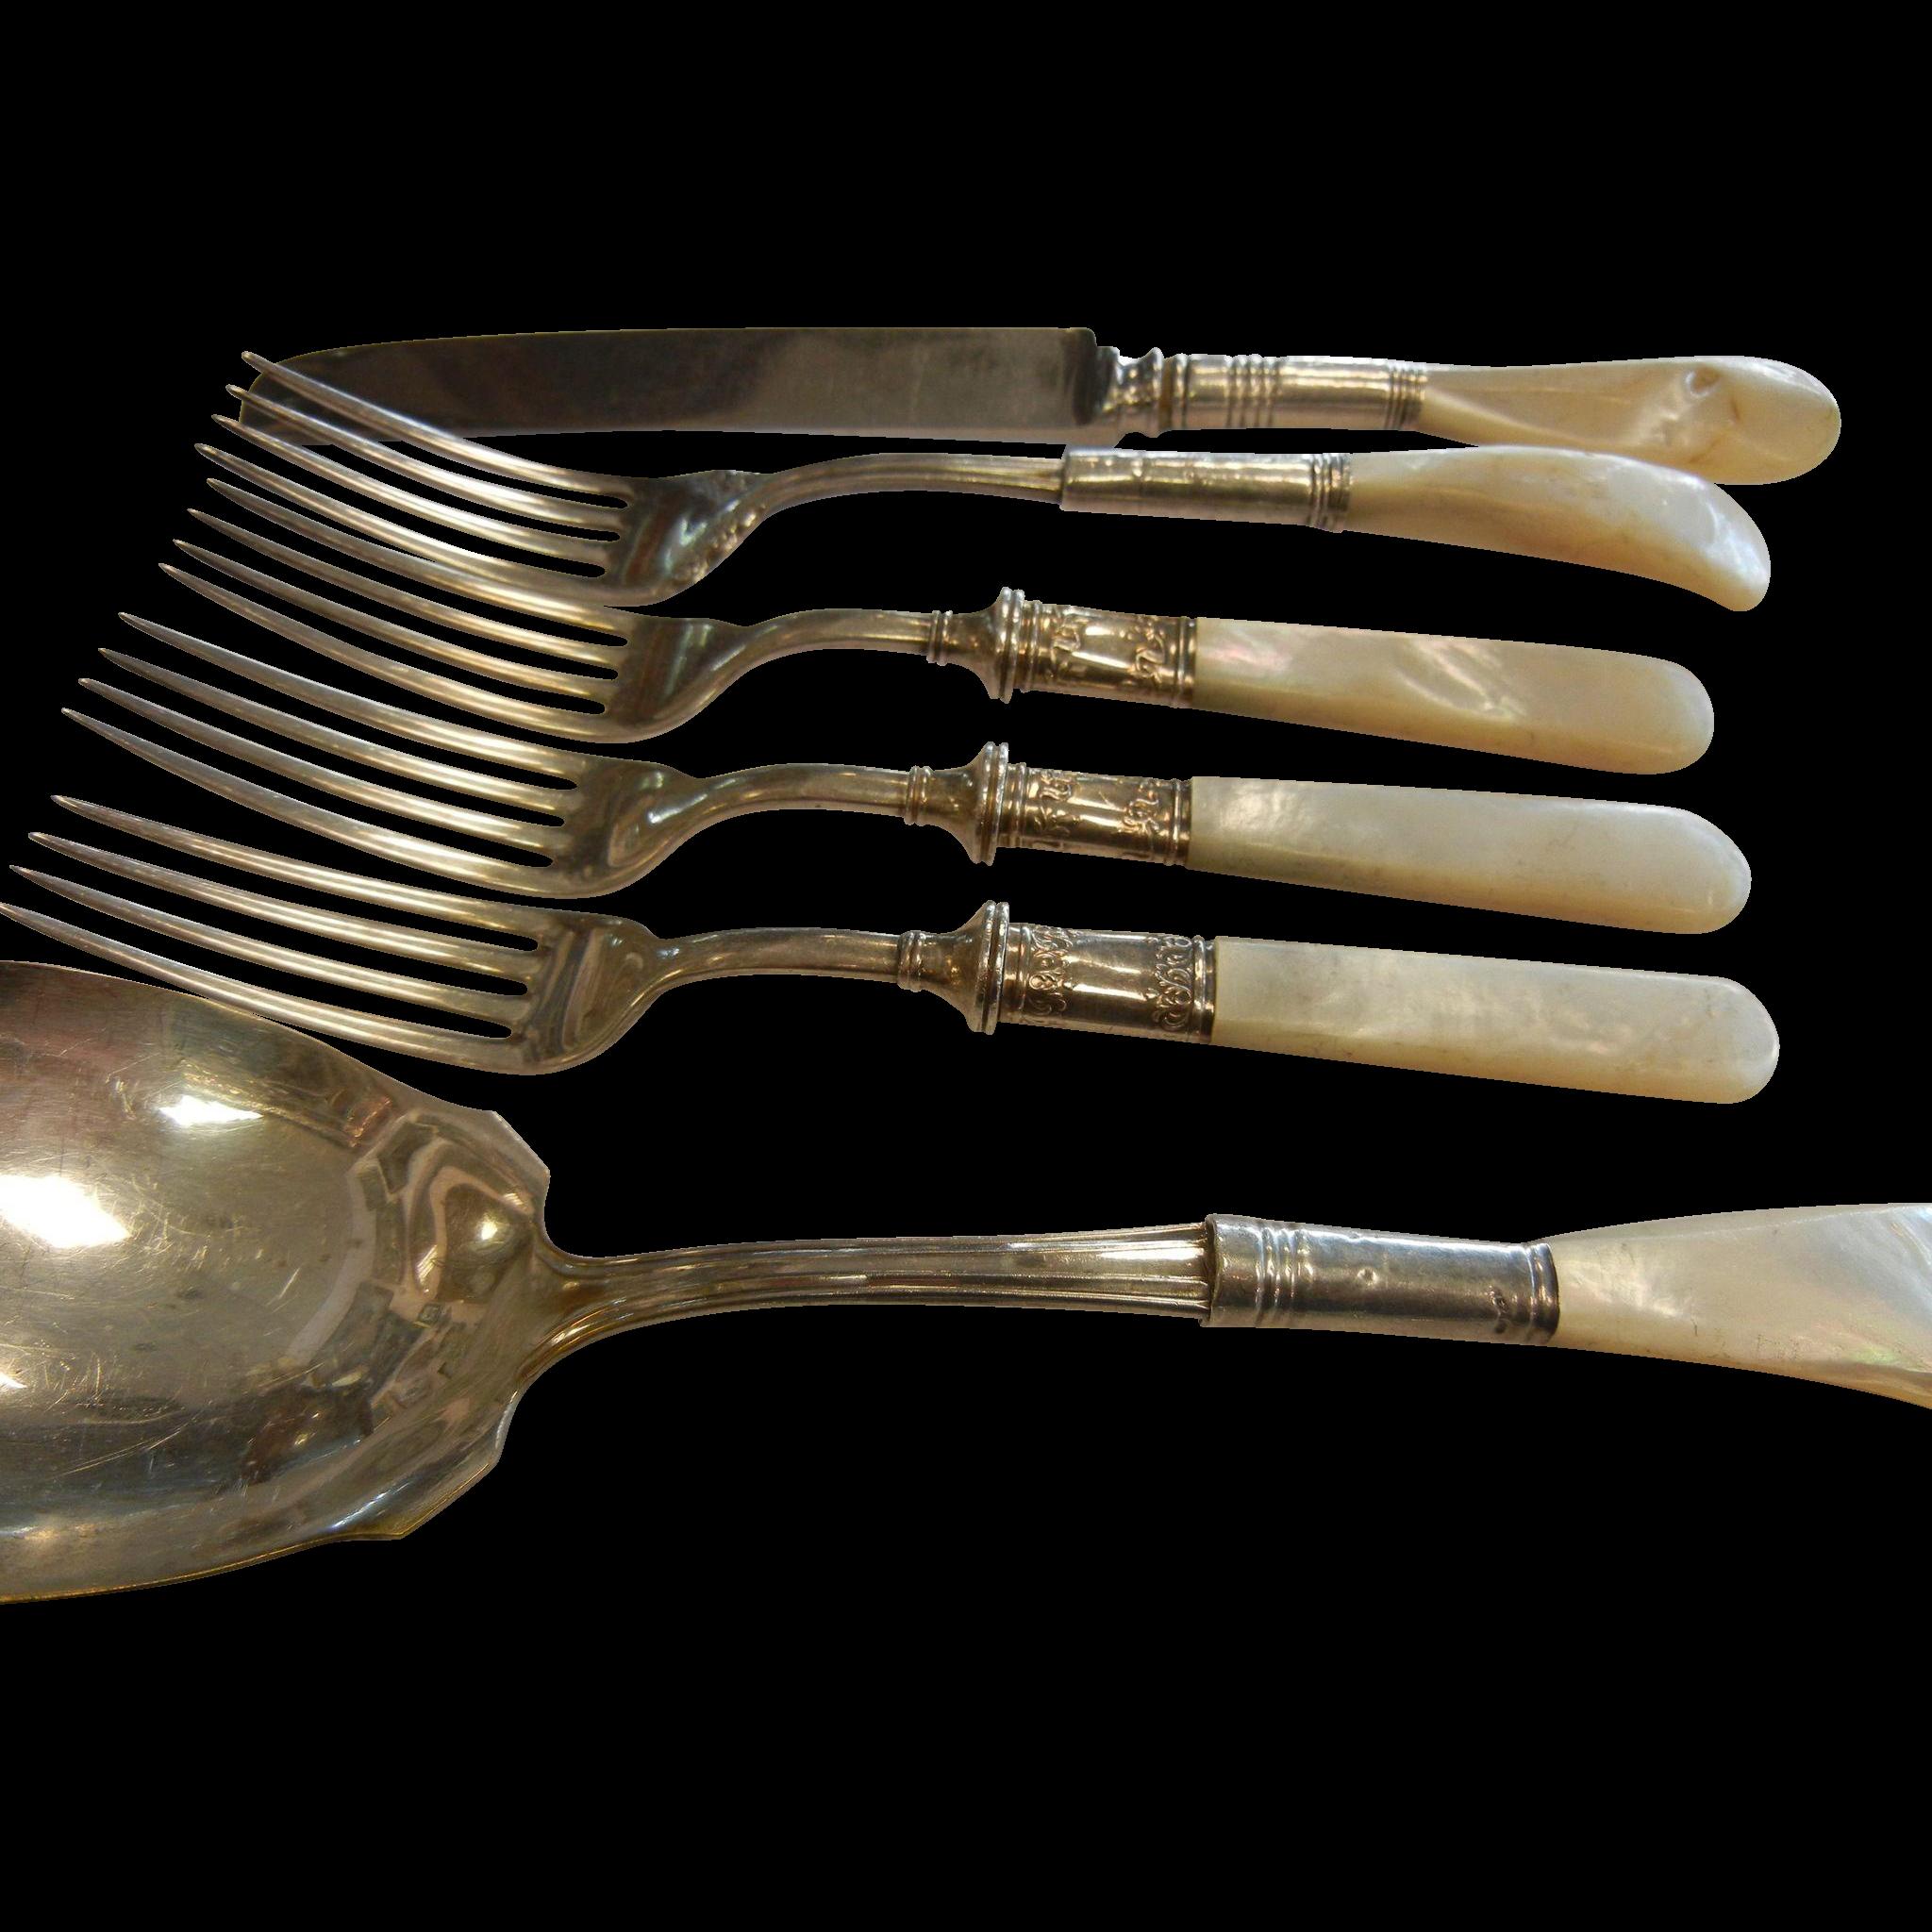 Vintage stering silverware set w mother of pearl handles from henriettas on ruby lane - Pearl handled flatware ...